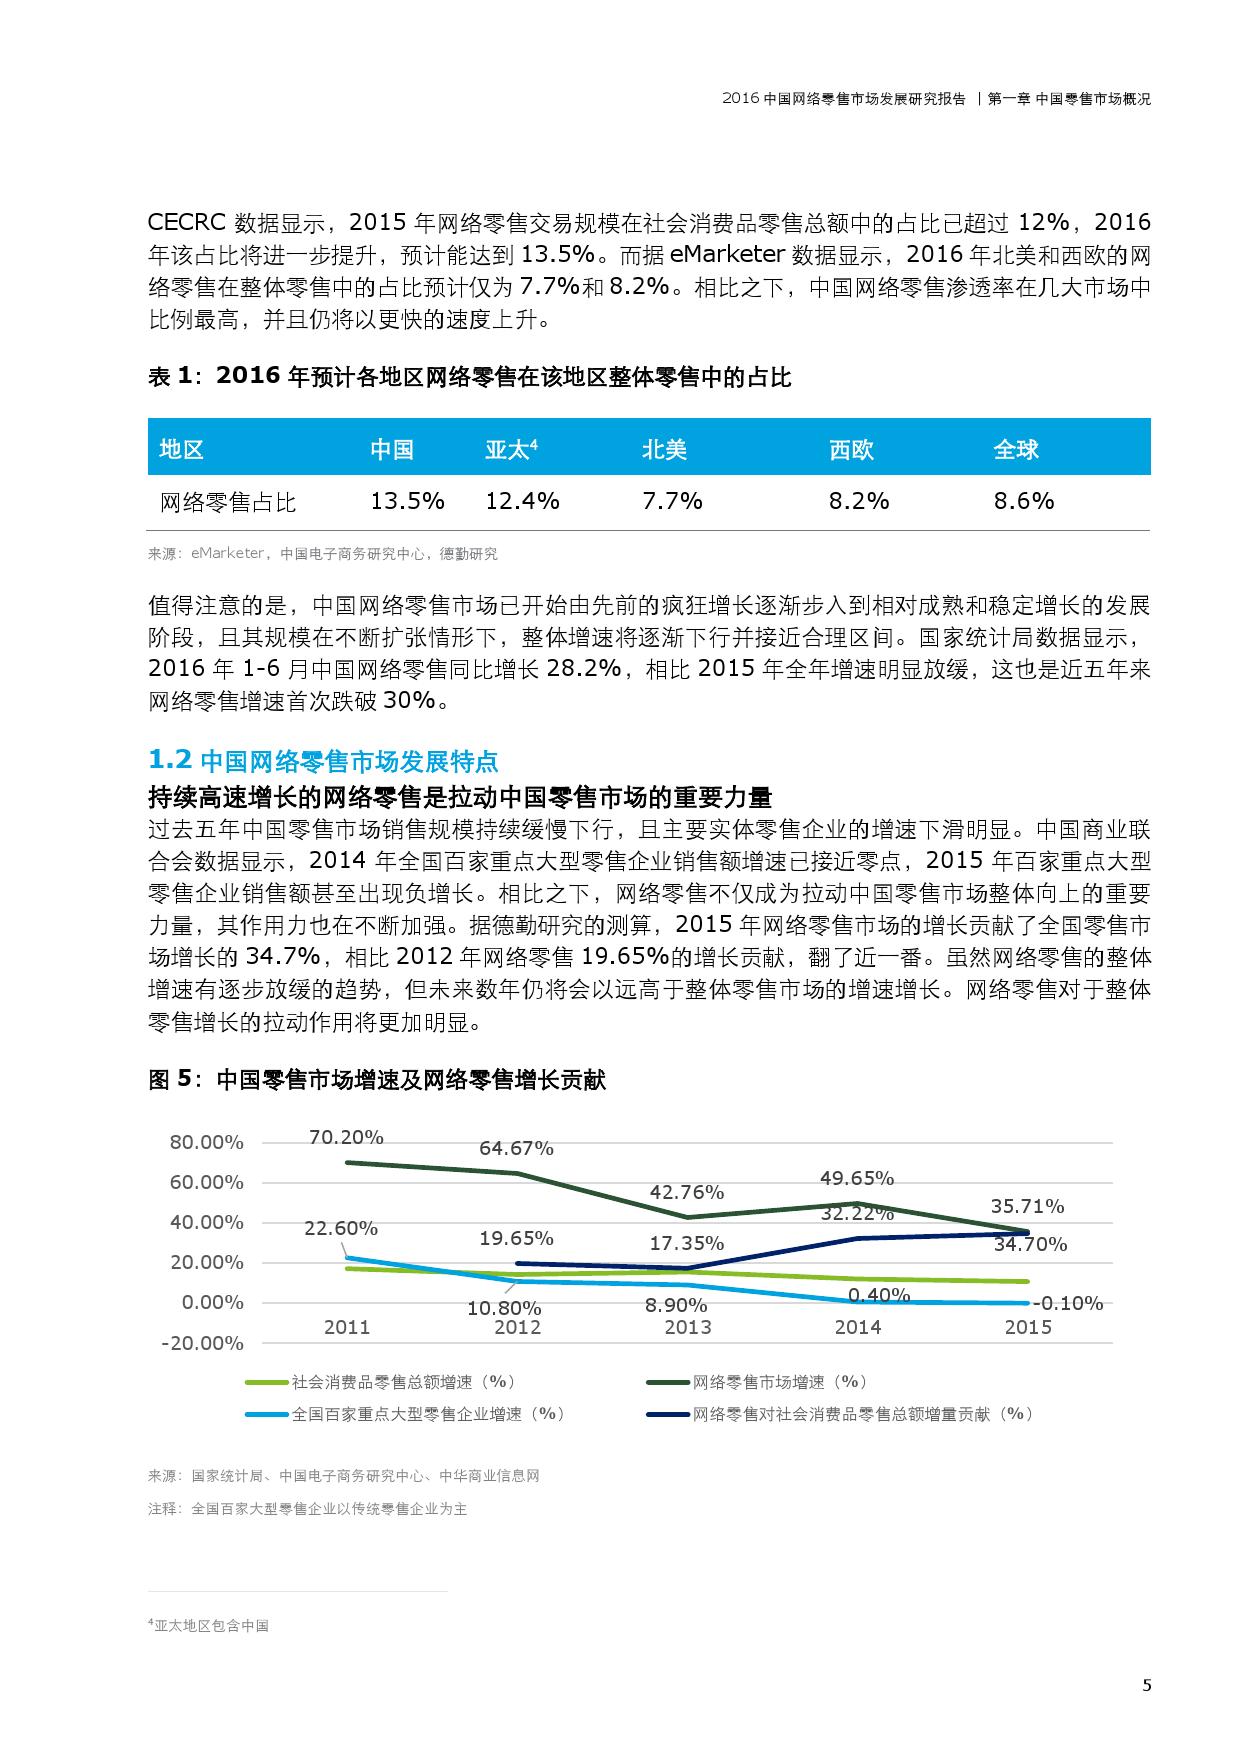 2016%e4%b8%ad%e5%9b%bd%e7%bd%91%e7%bb%9c%e9%9b%b6%e5%94%ae%e5%b8%82%e5%9c%ba%e5%8f%91%e5%b1%95%e7%a0%94%e7%a9%b6%e6%8a%a5%e5%91%8a_000009